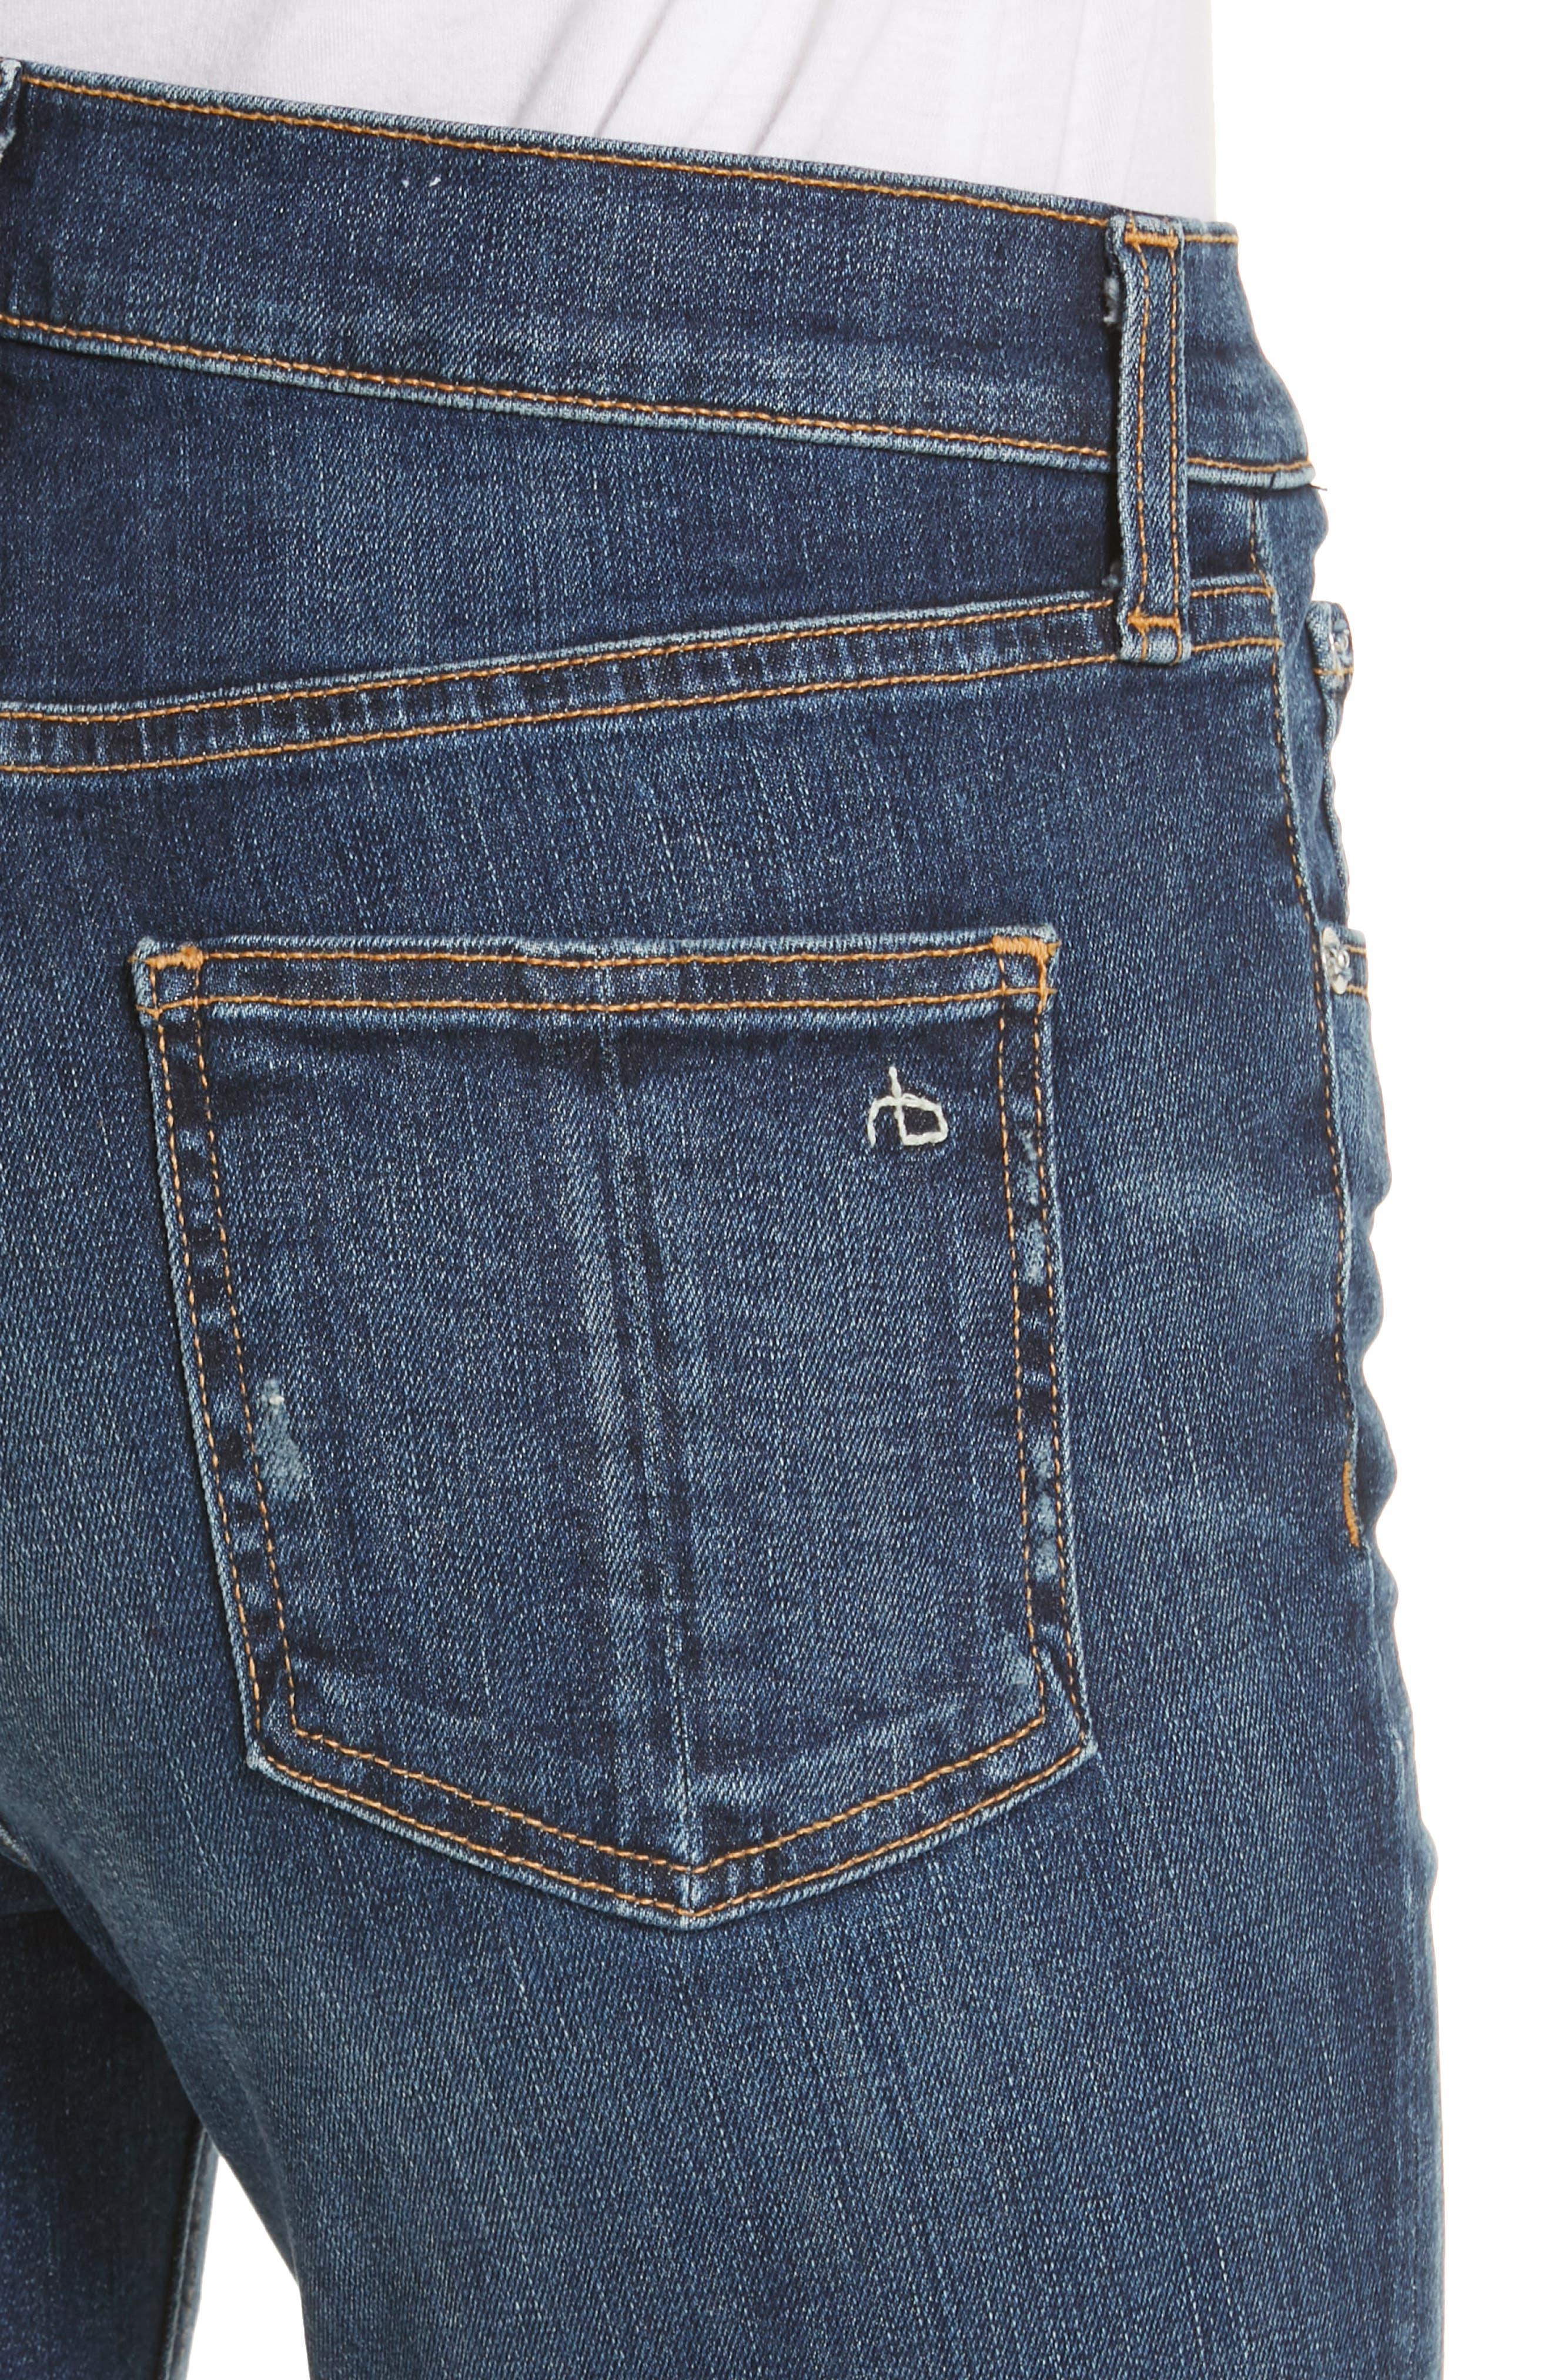 Ripped High Waist Skinny Jeans,                             Alternate thumbnail 4, color,                             ELTON